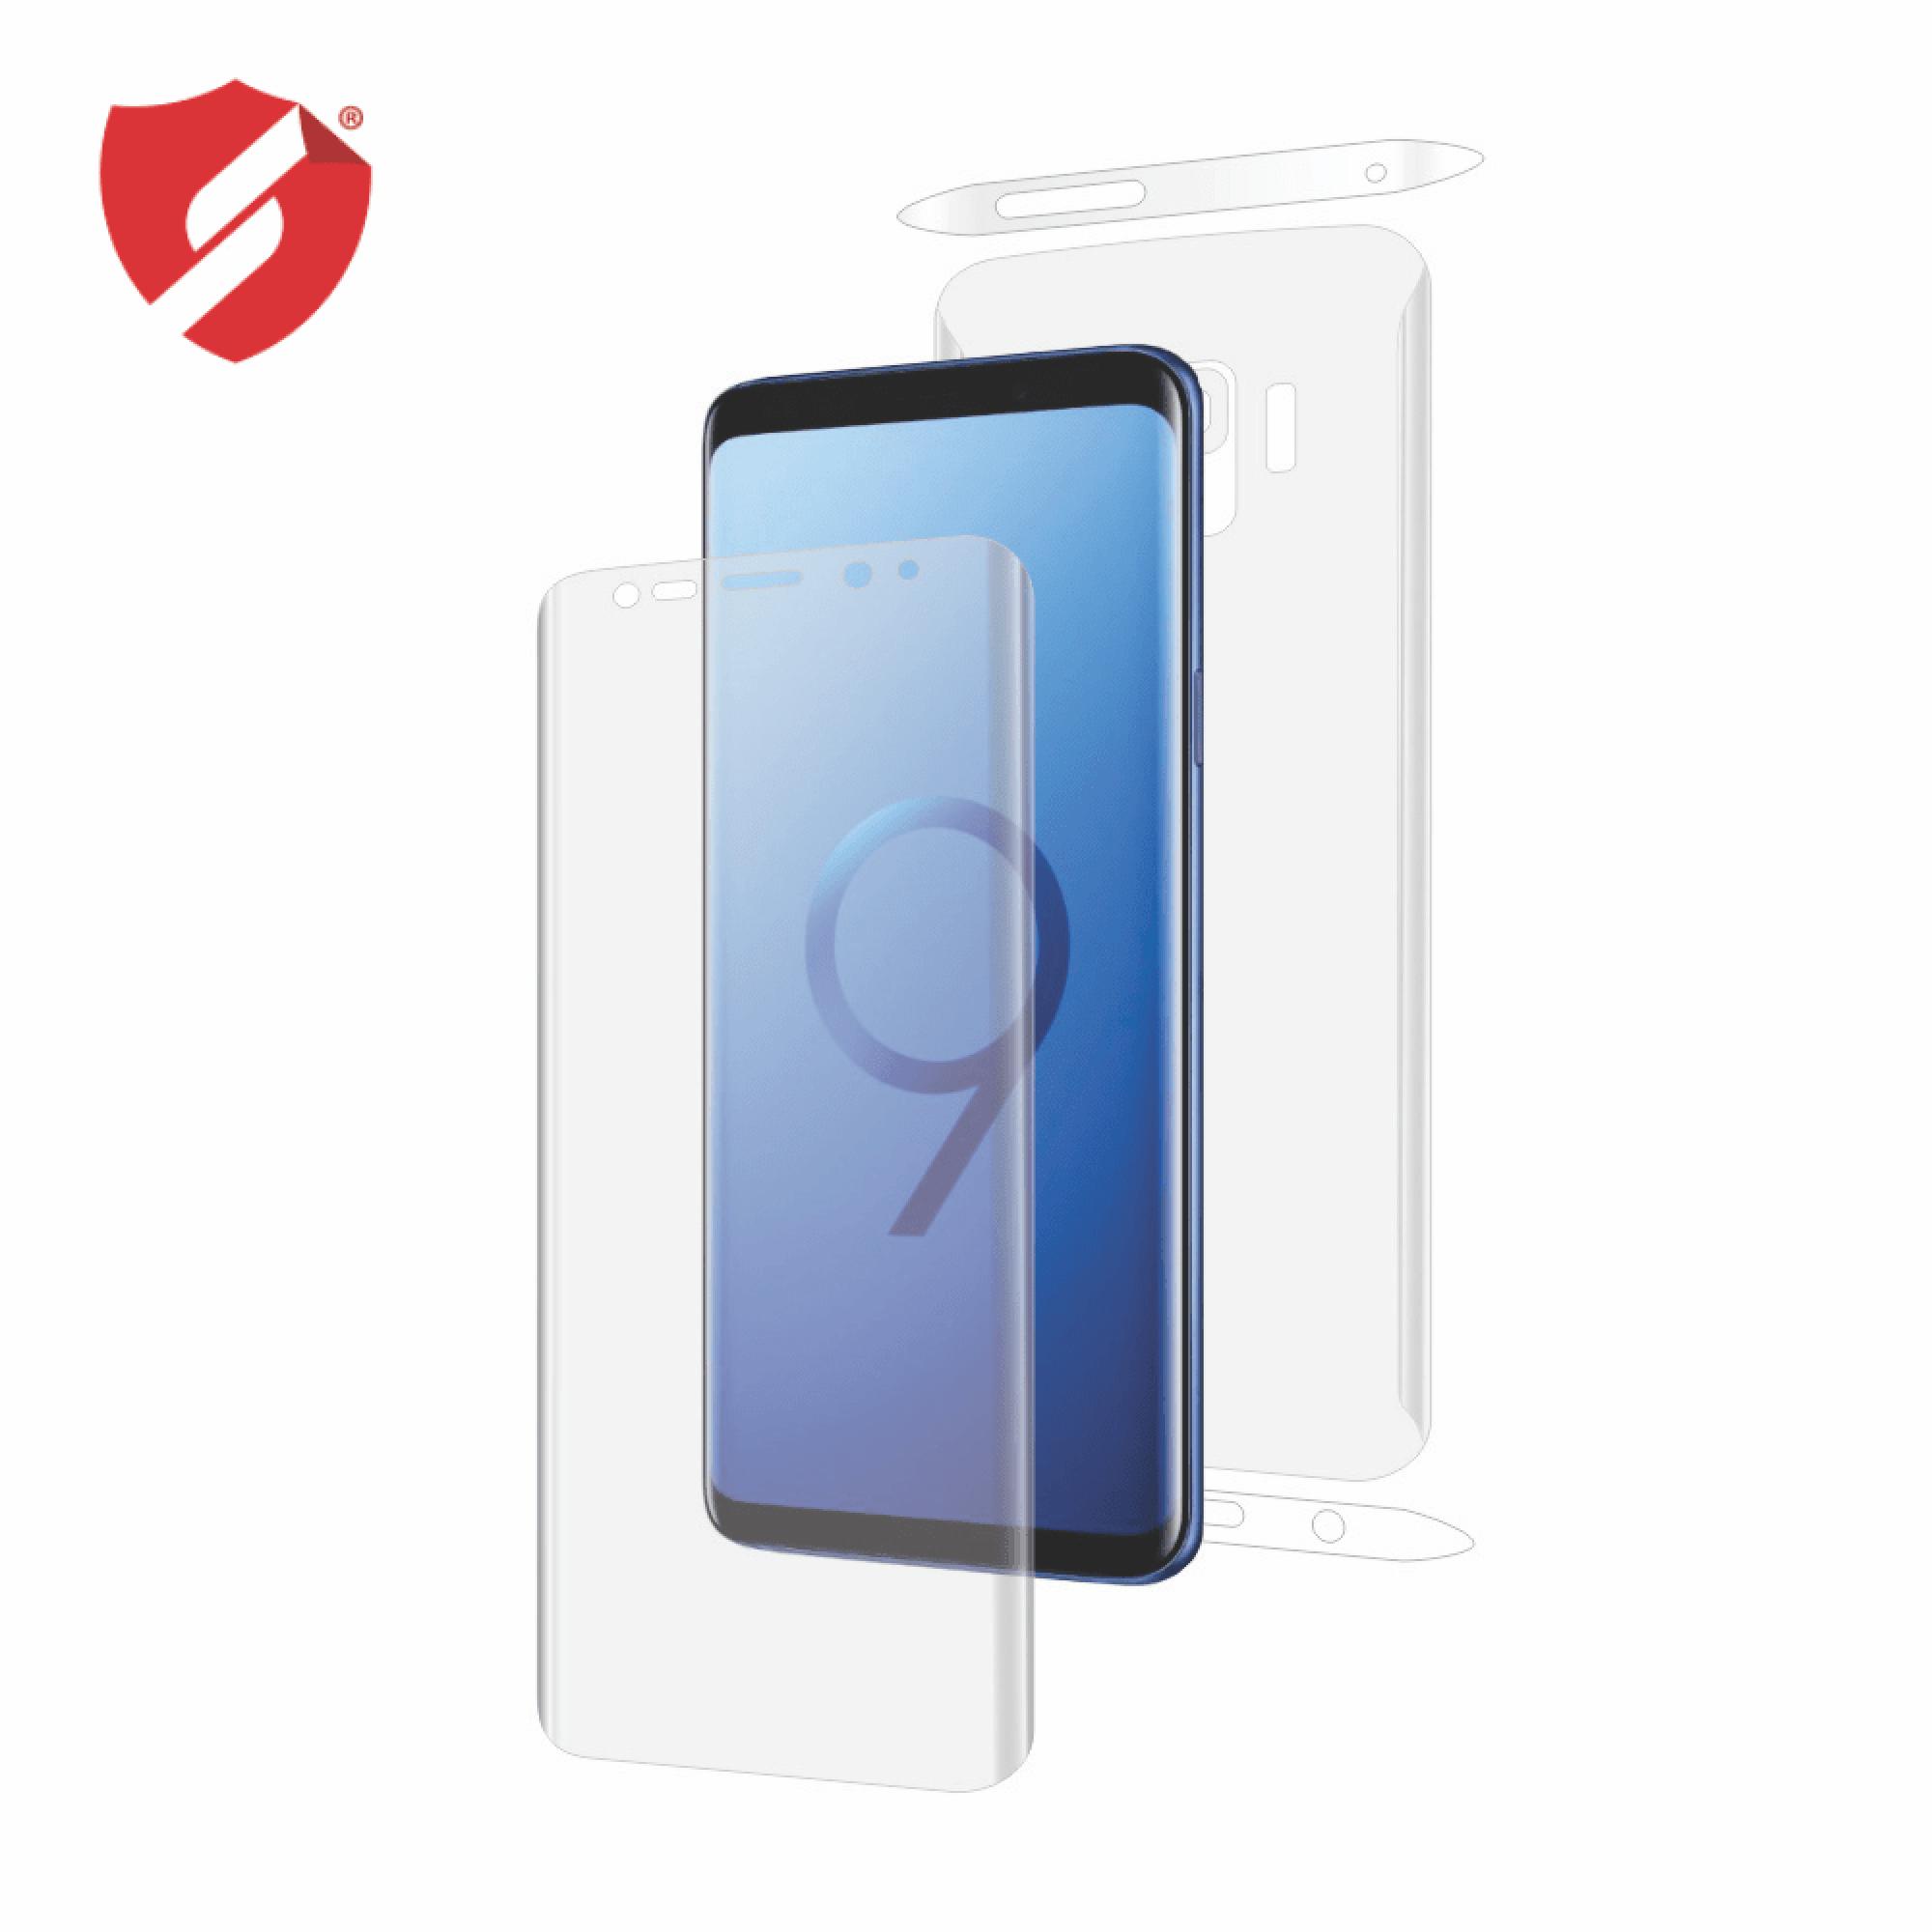 Folie de protectie Smart Protection Samsung Galaxy S9 compatibila cu carcasa Alcantara - fullbody - display + spate + laterale imagine